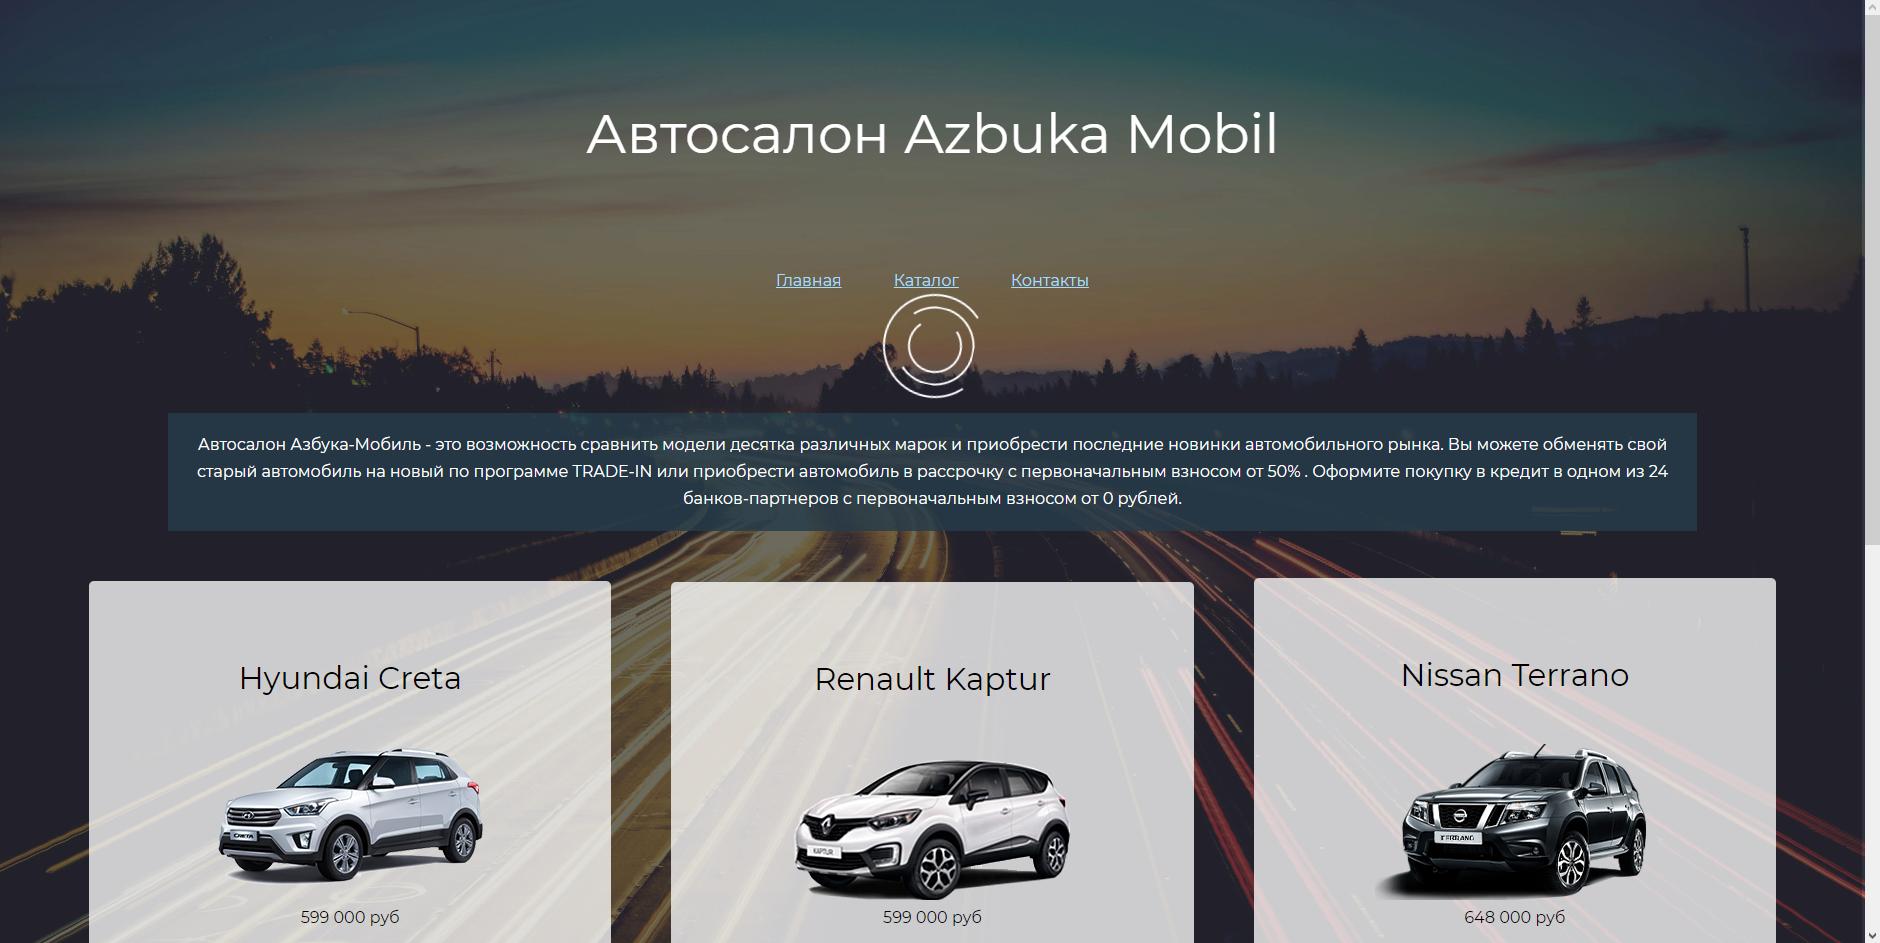 Азбука - Мобиль автосалон